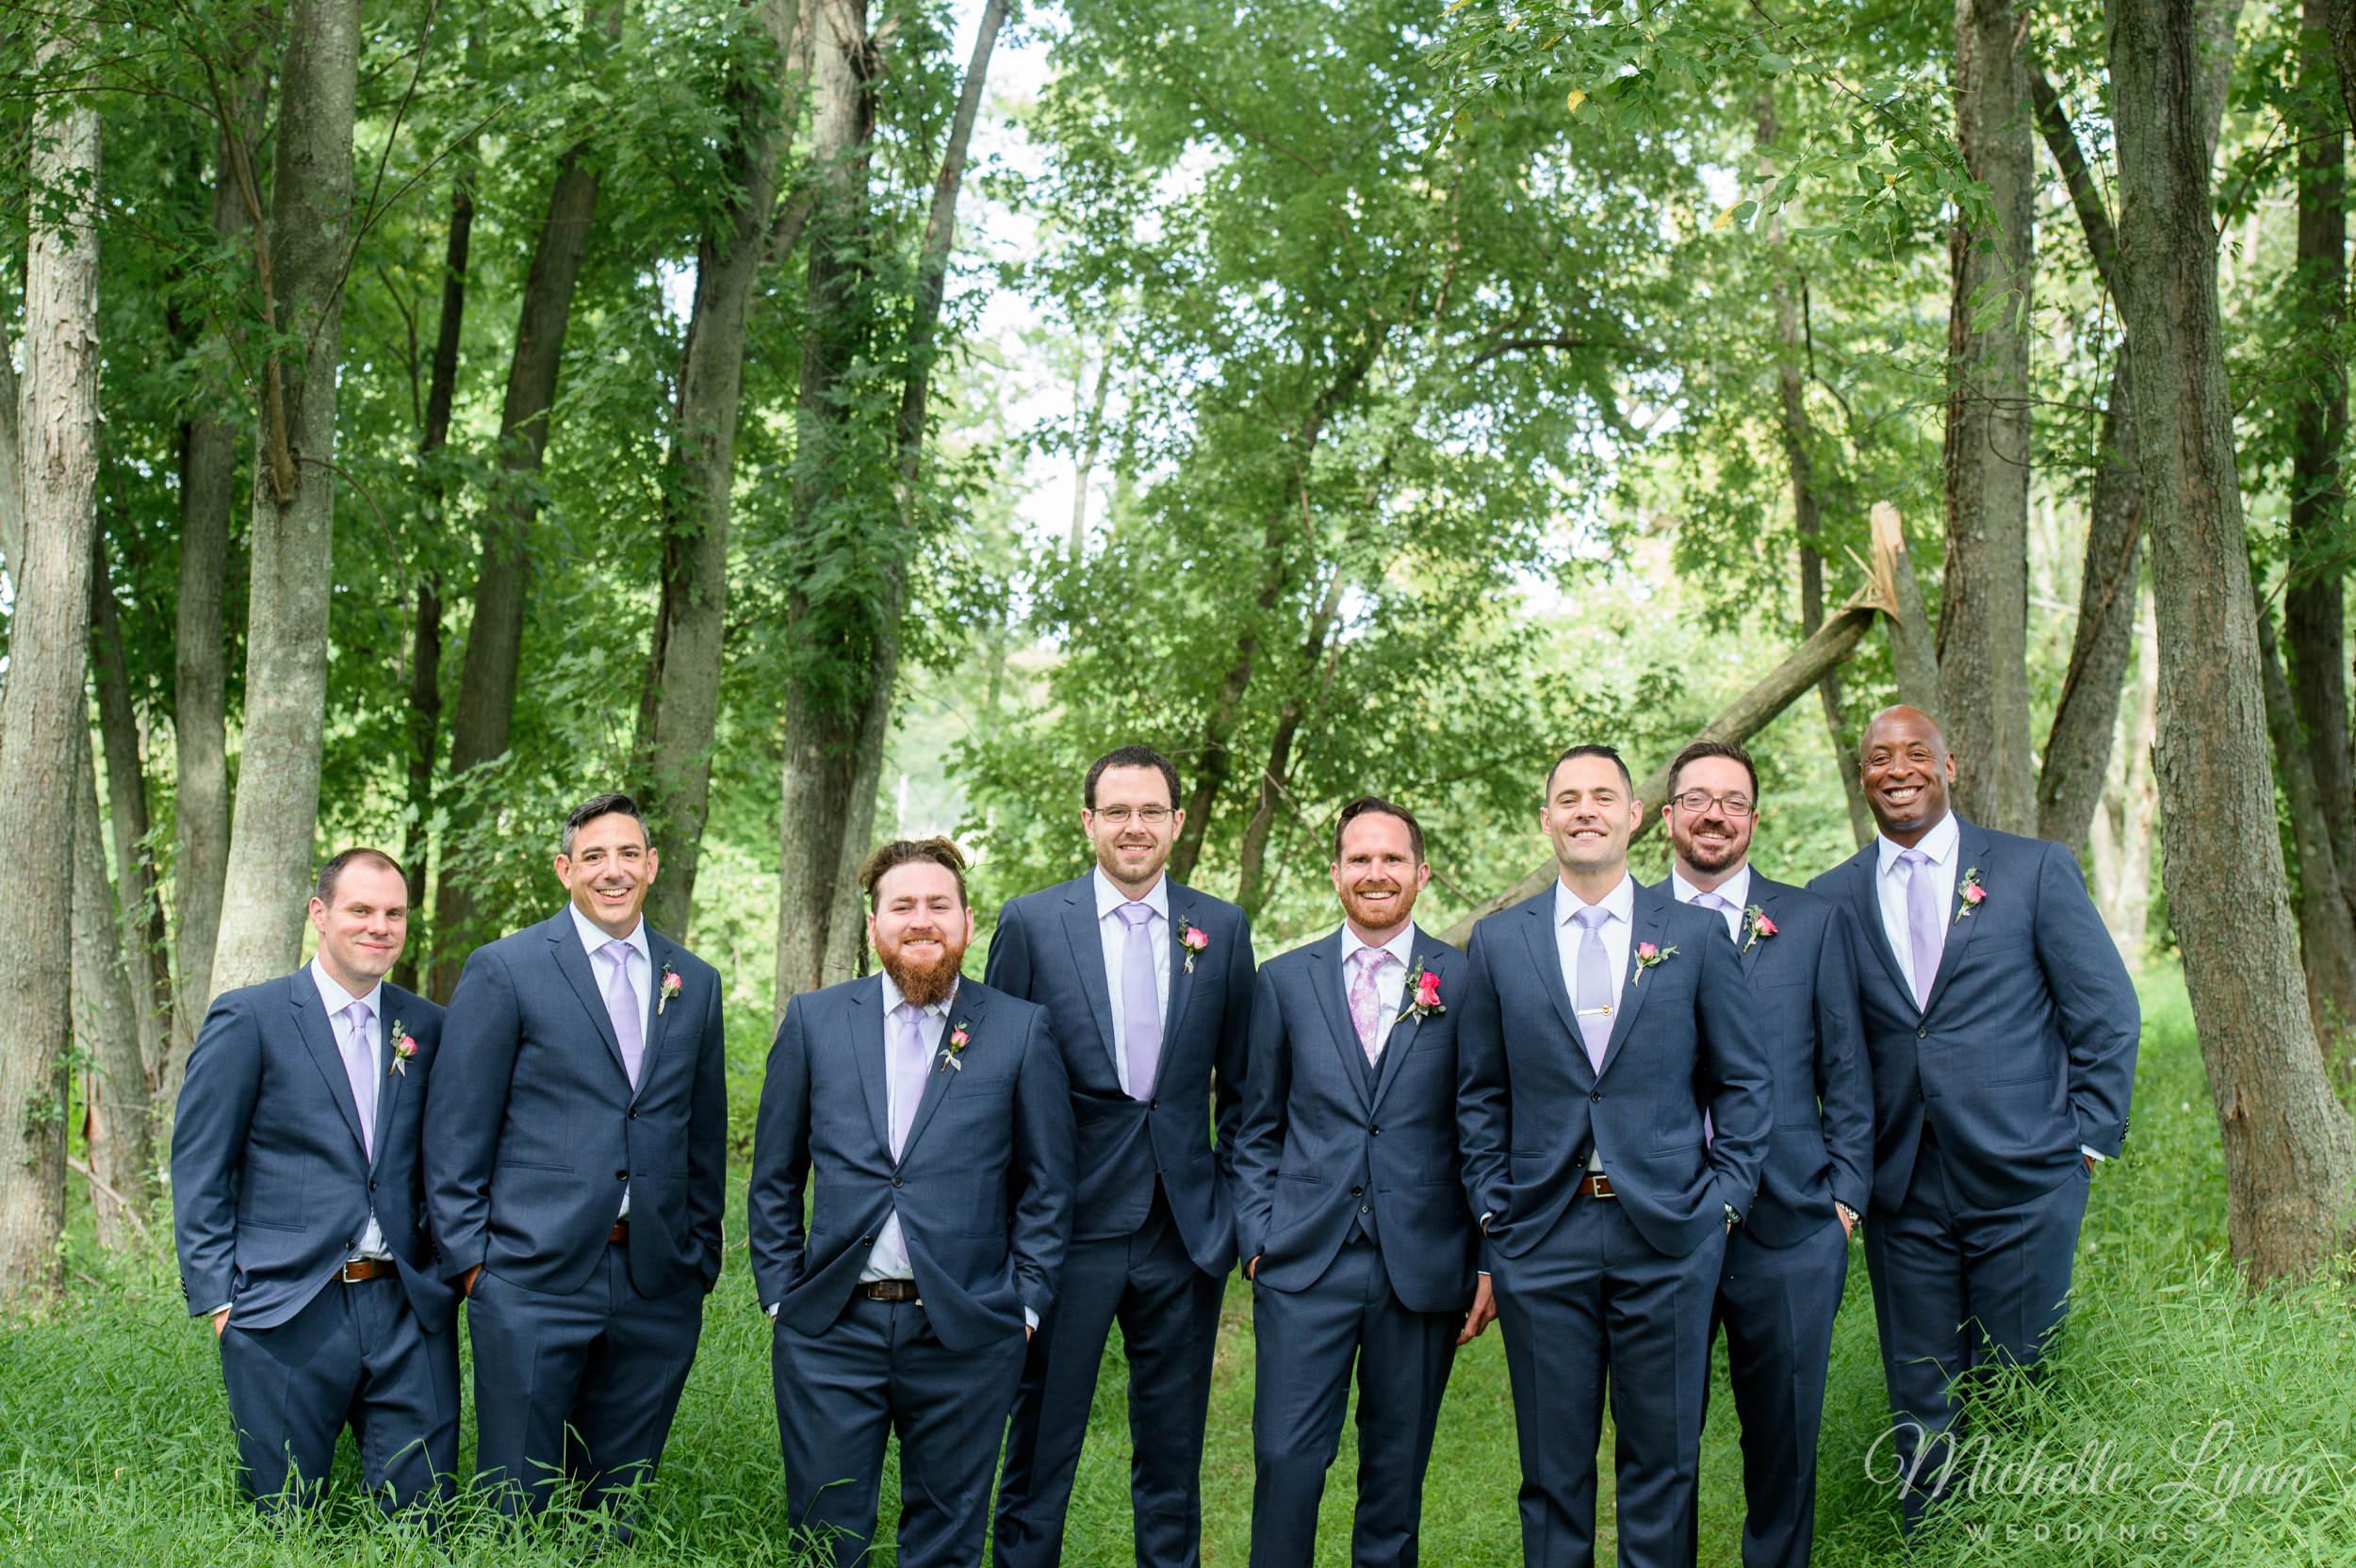 mlw-unionville-vineyards-nj-wedding-photography-55.jpg